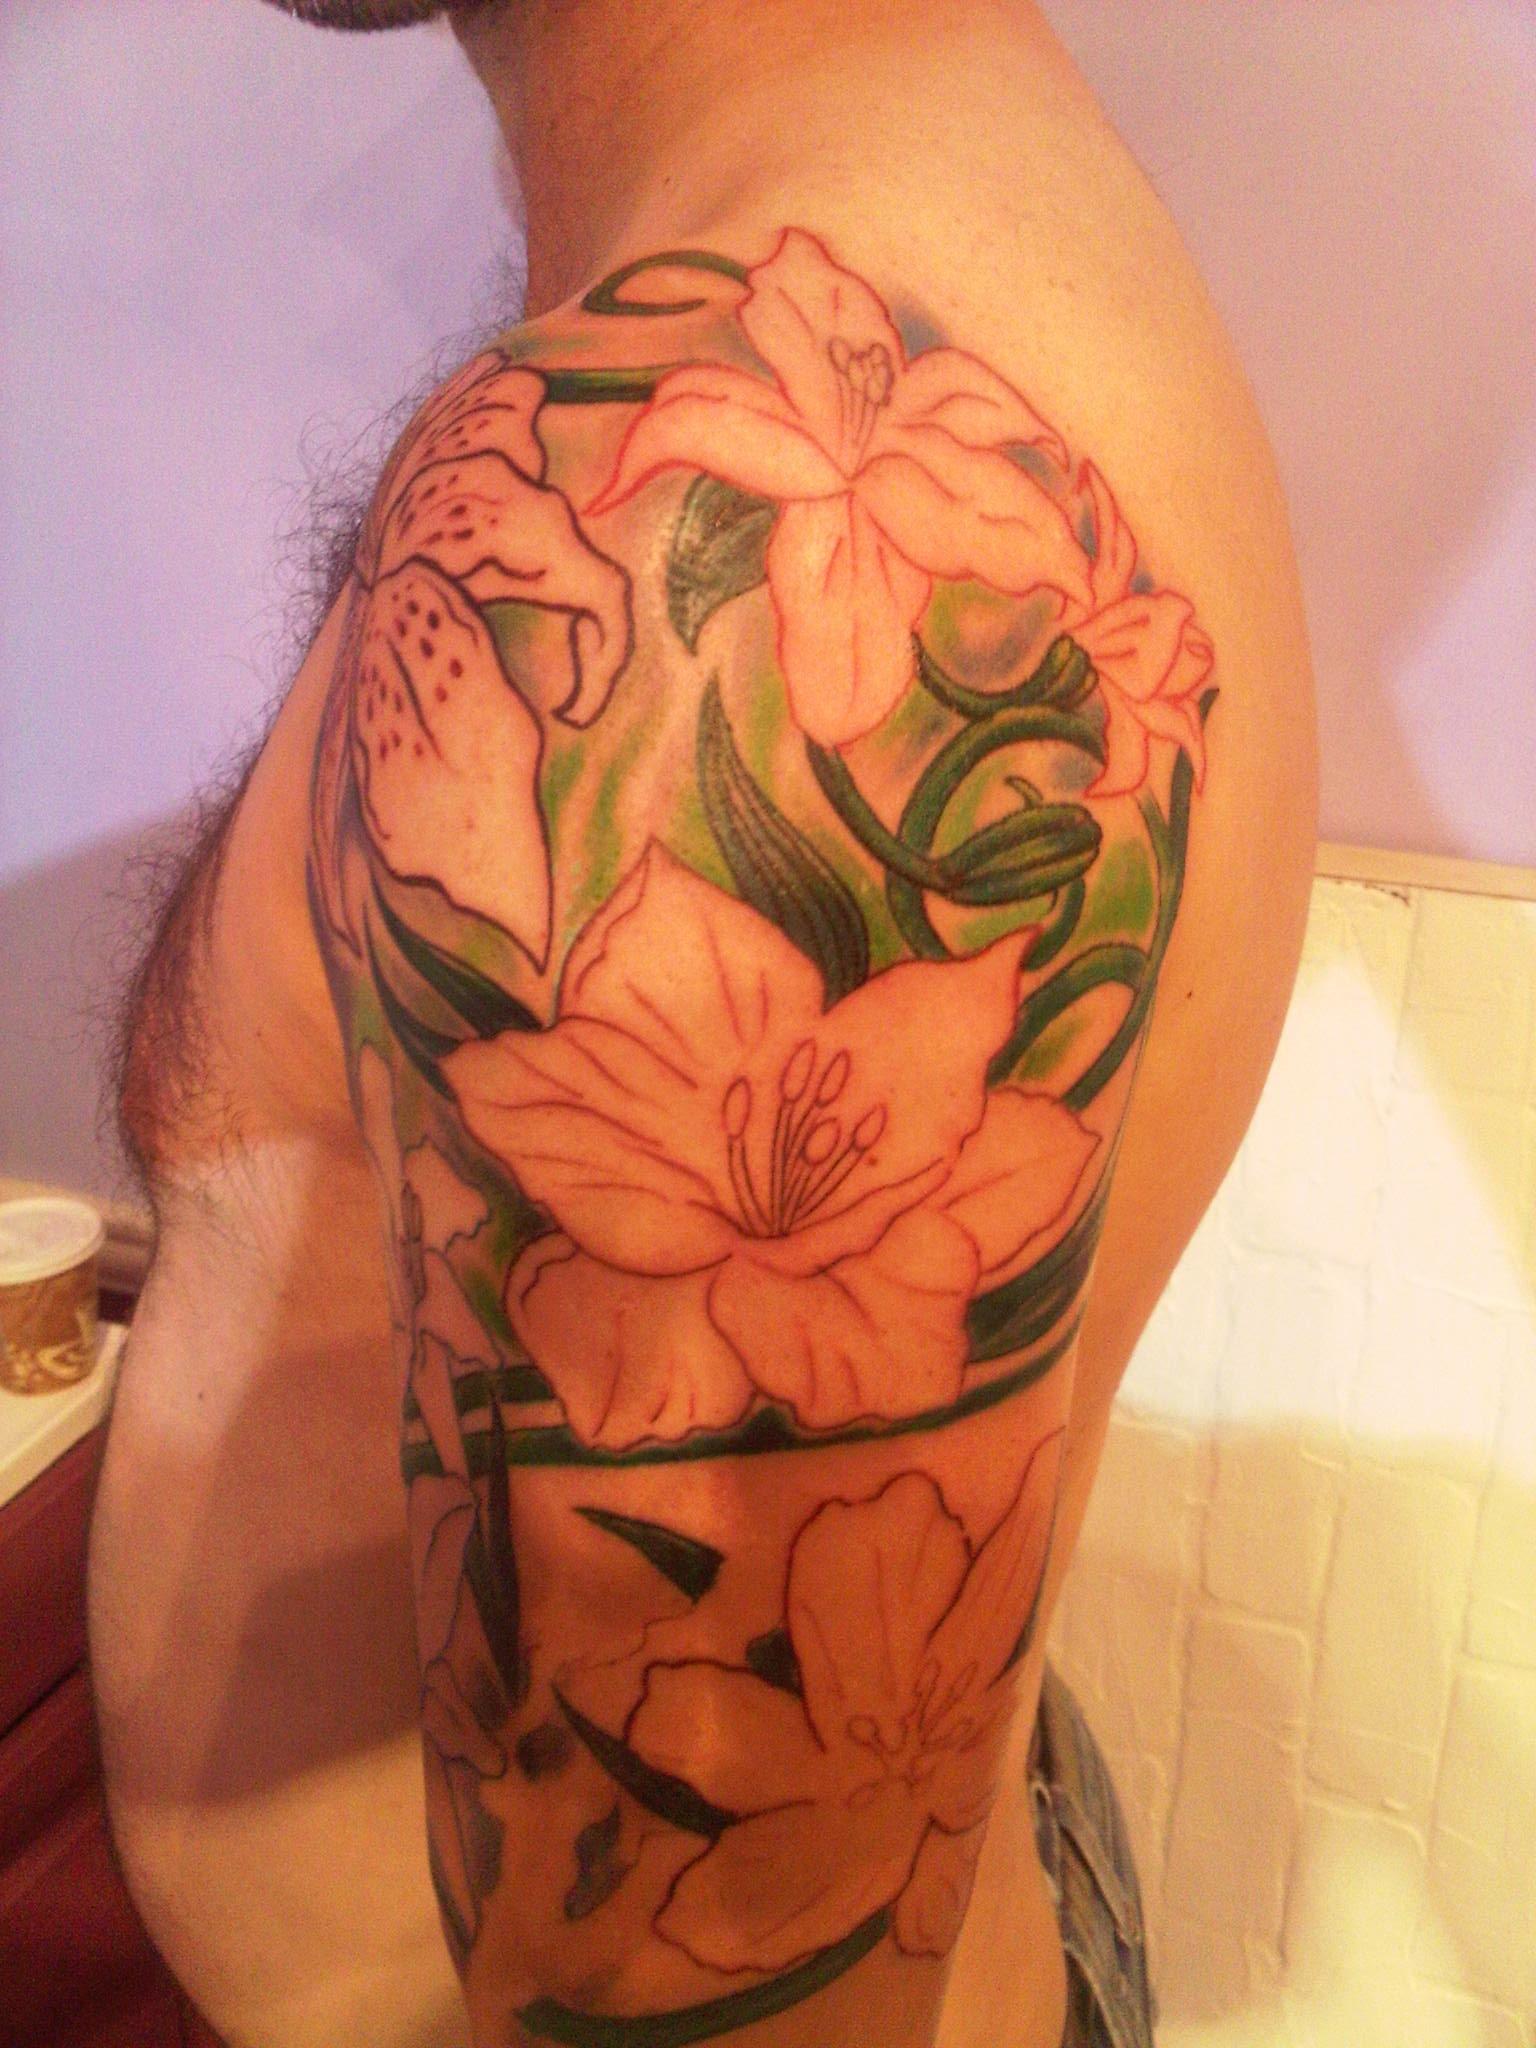 Cattleya Flower Tattoo Designs